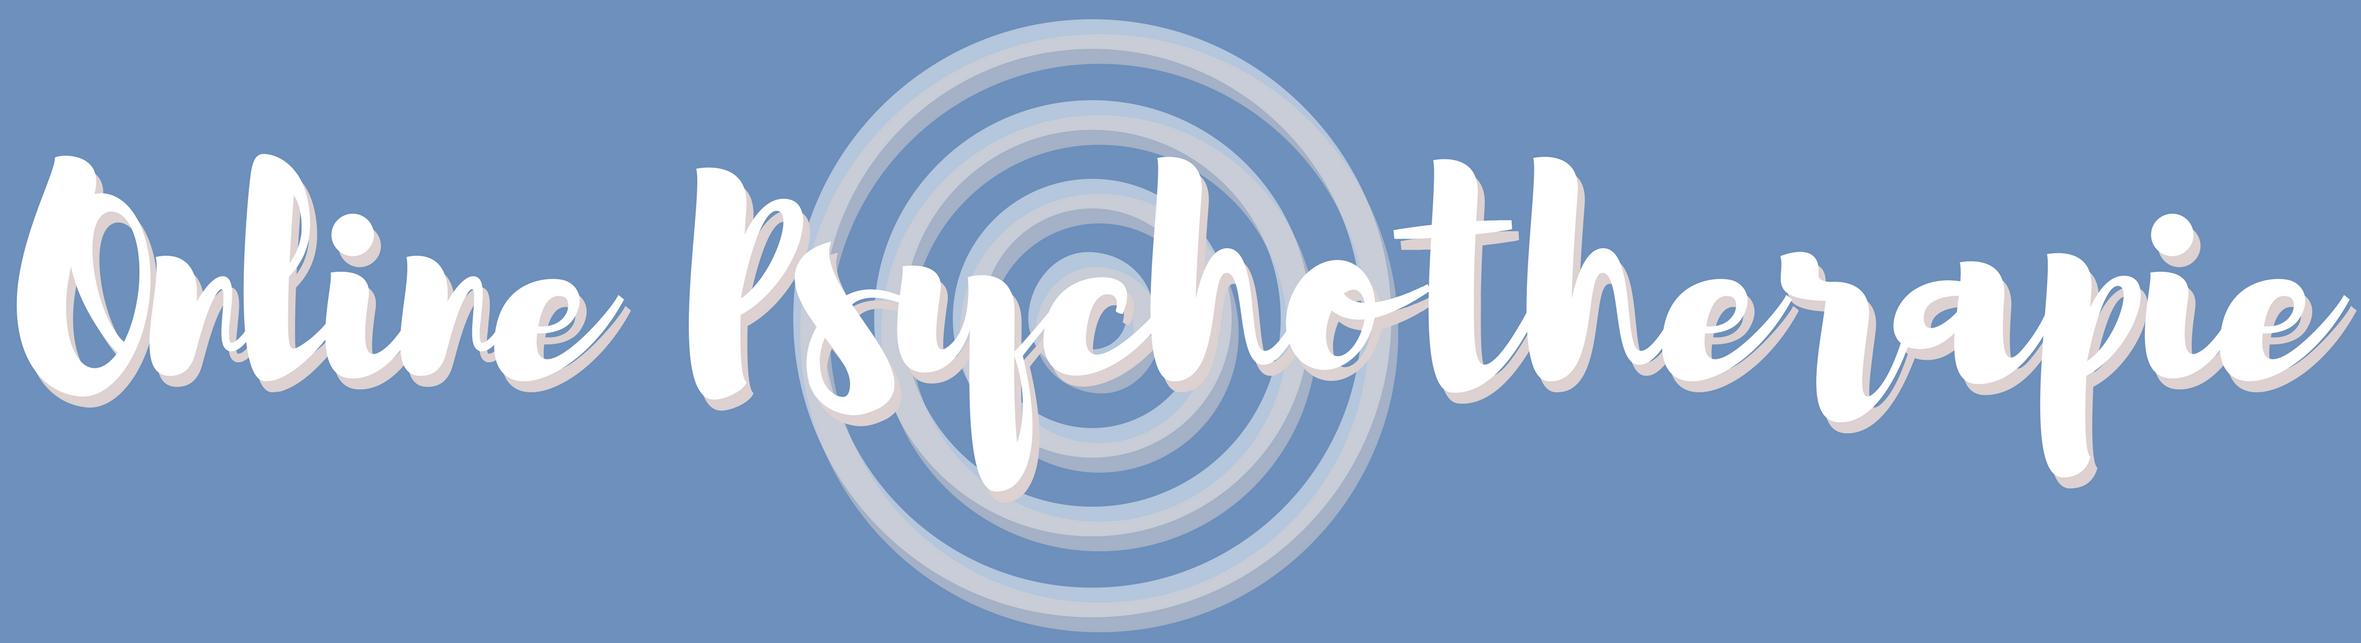 Online Psychotherapie Logo